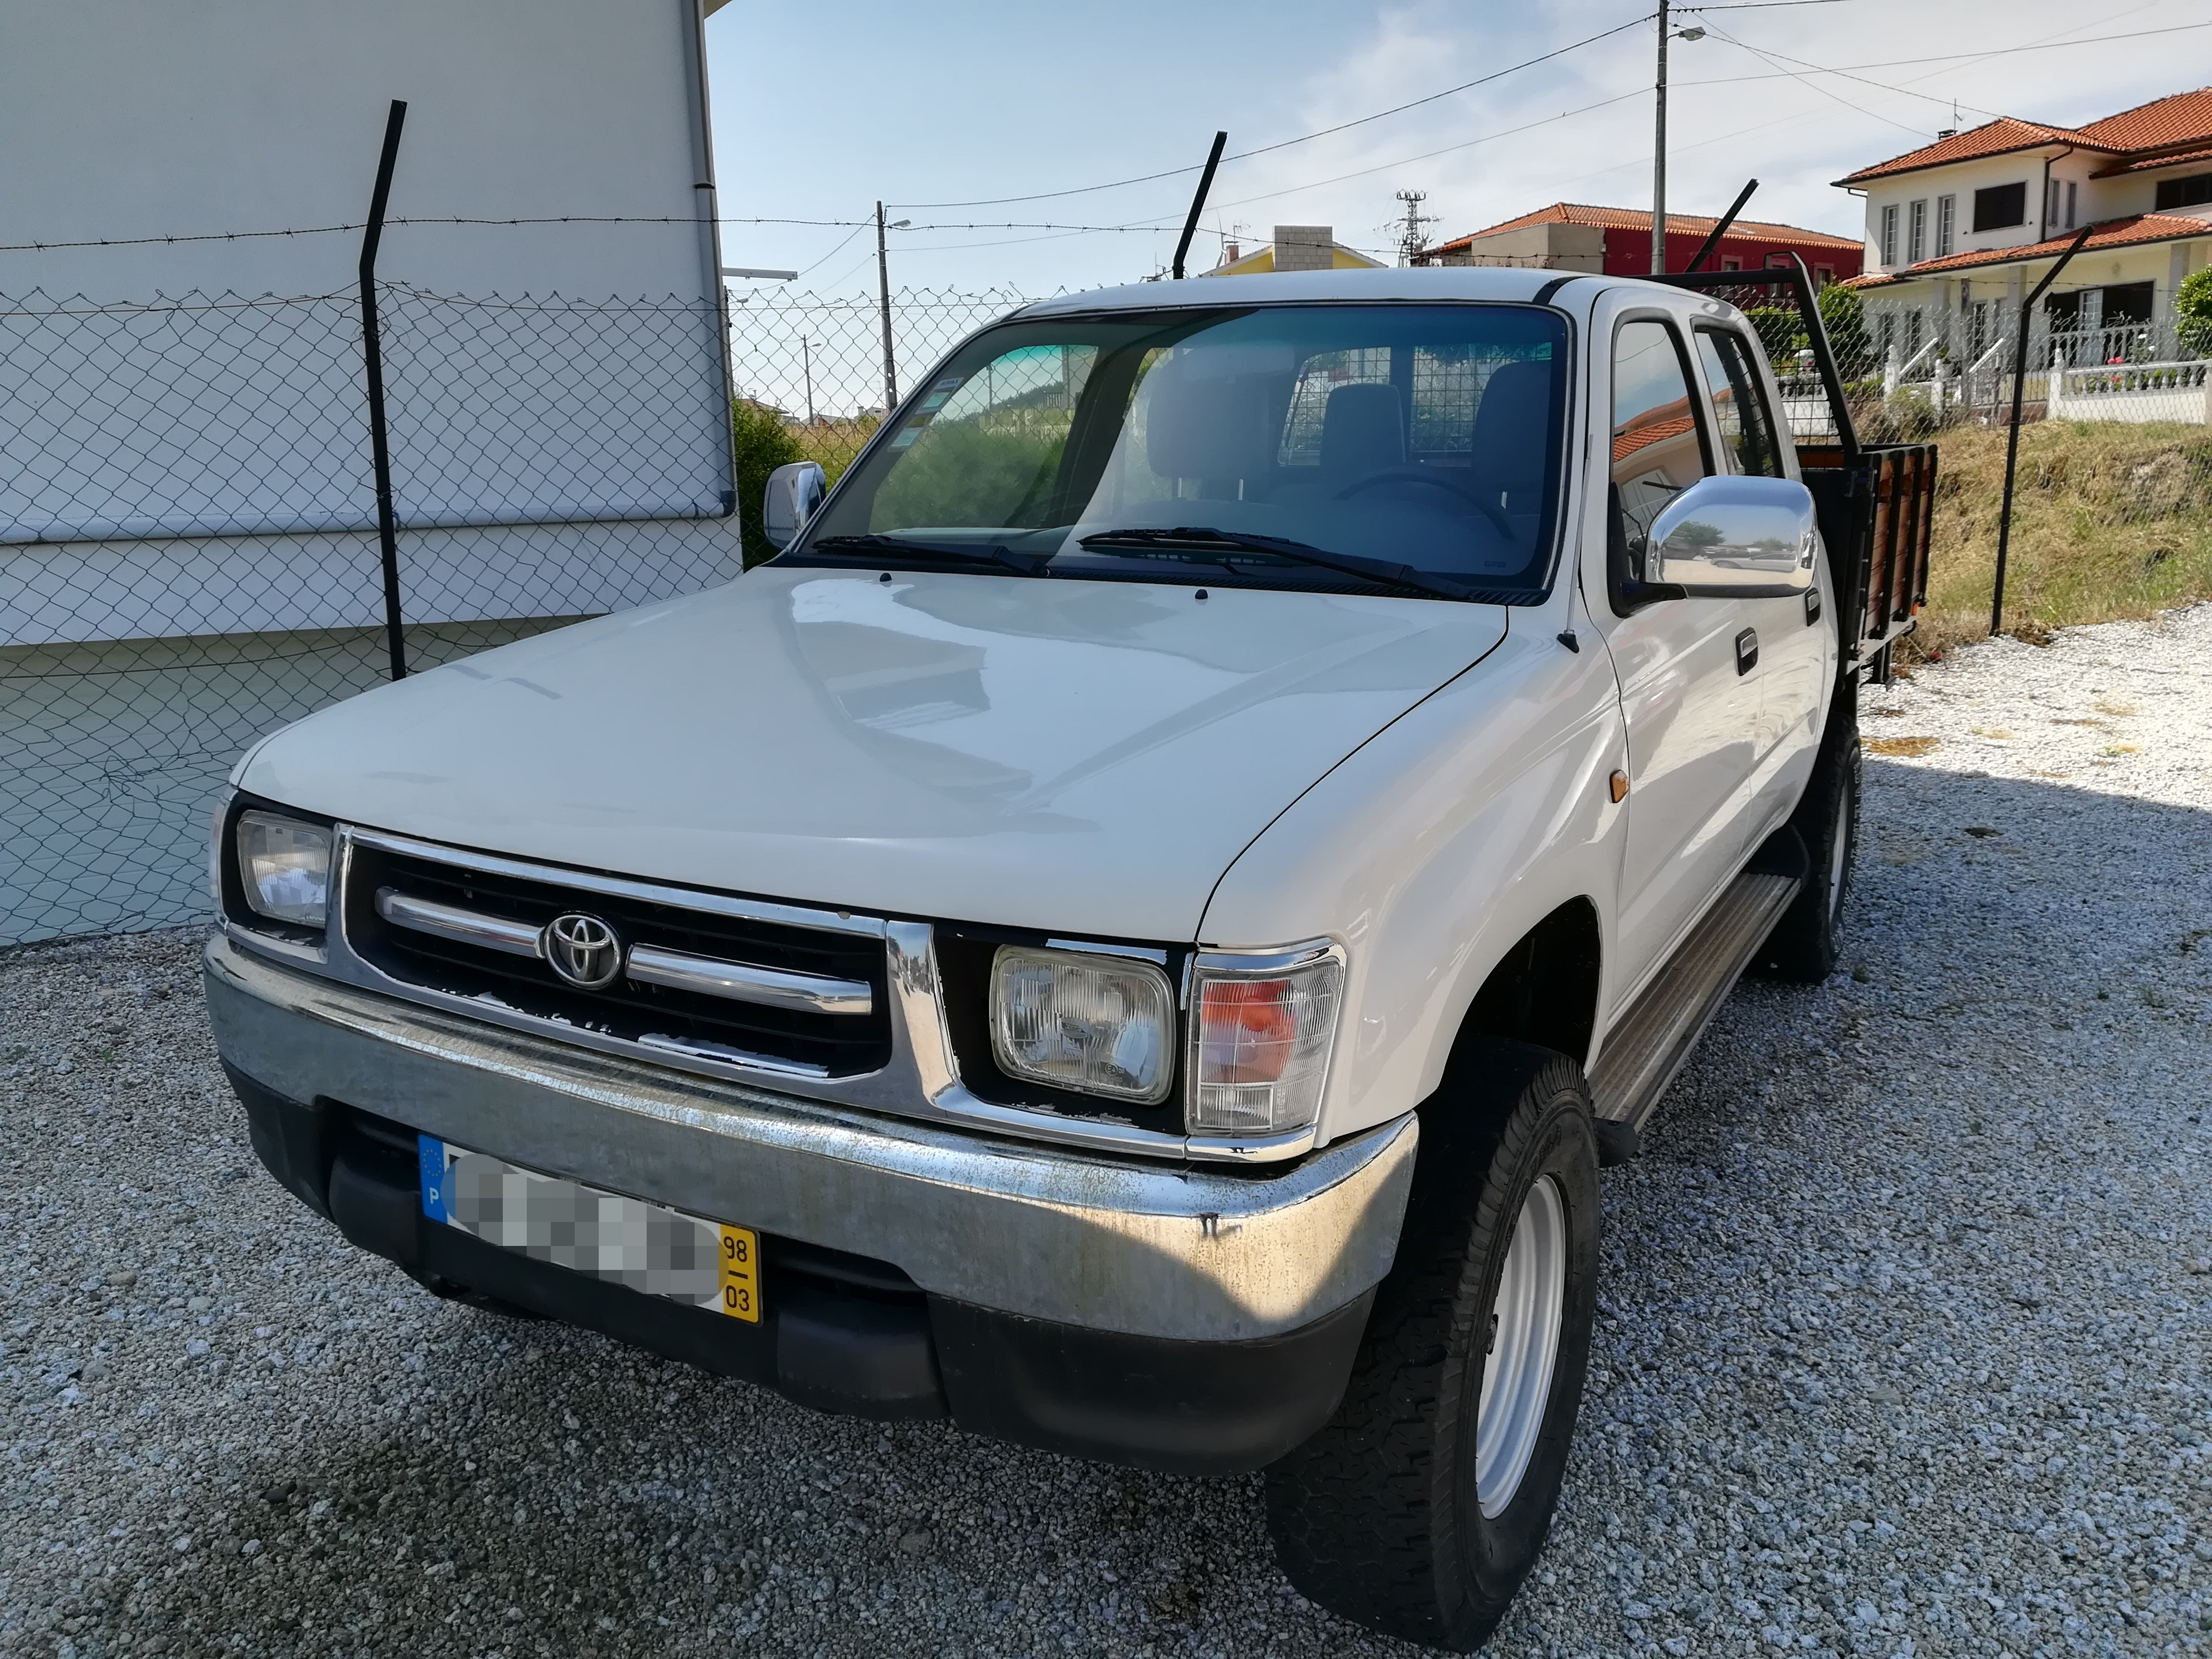 Toyota Hilux 4×4 turbo